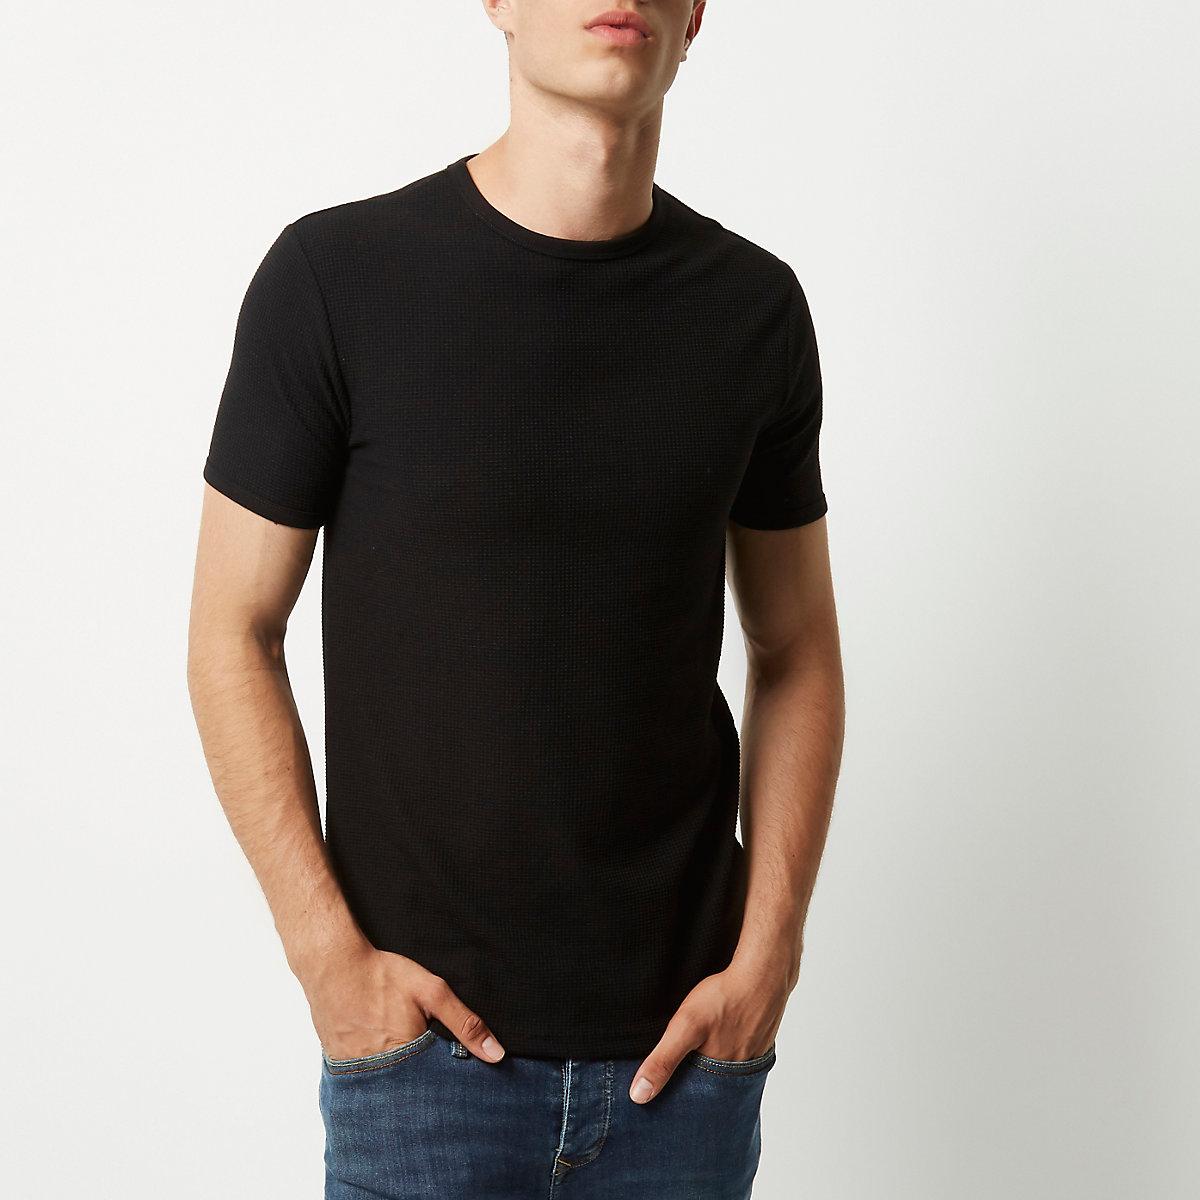 Schwarzes Muscle Fit T-Shirt